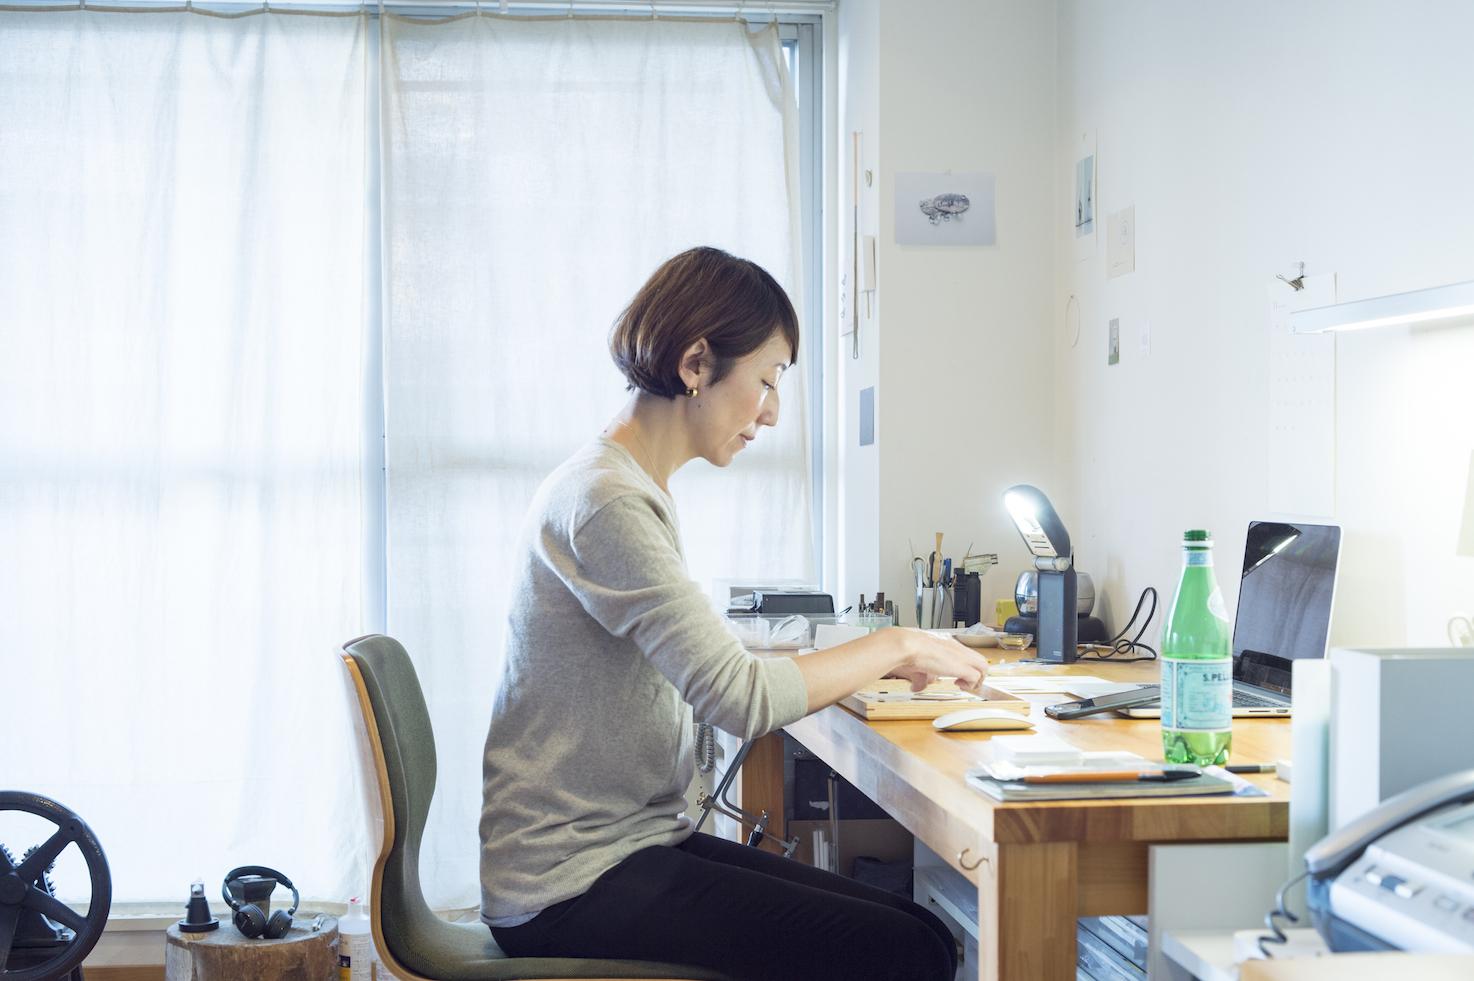 《 jaren 》佐々木史恵のブローチピン - コラム